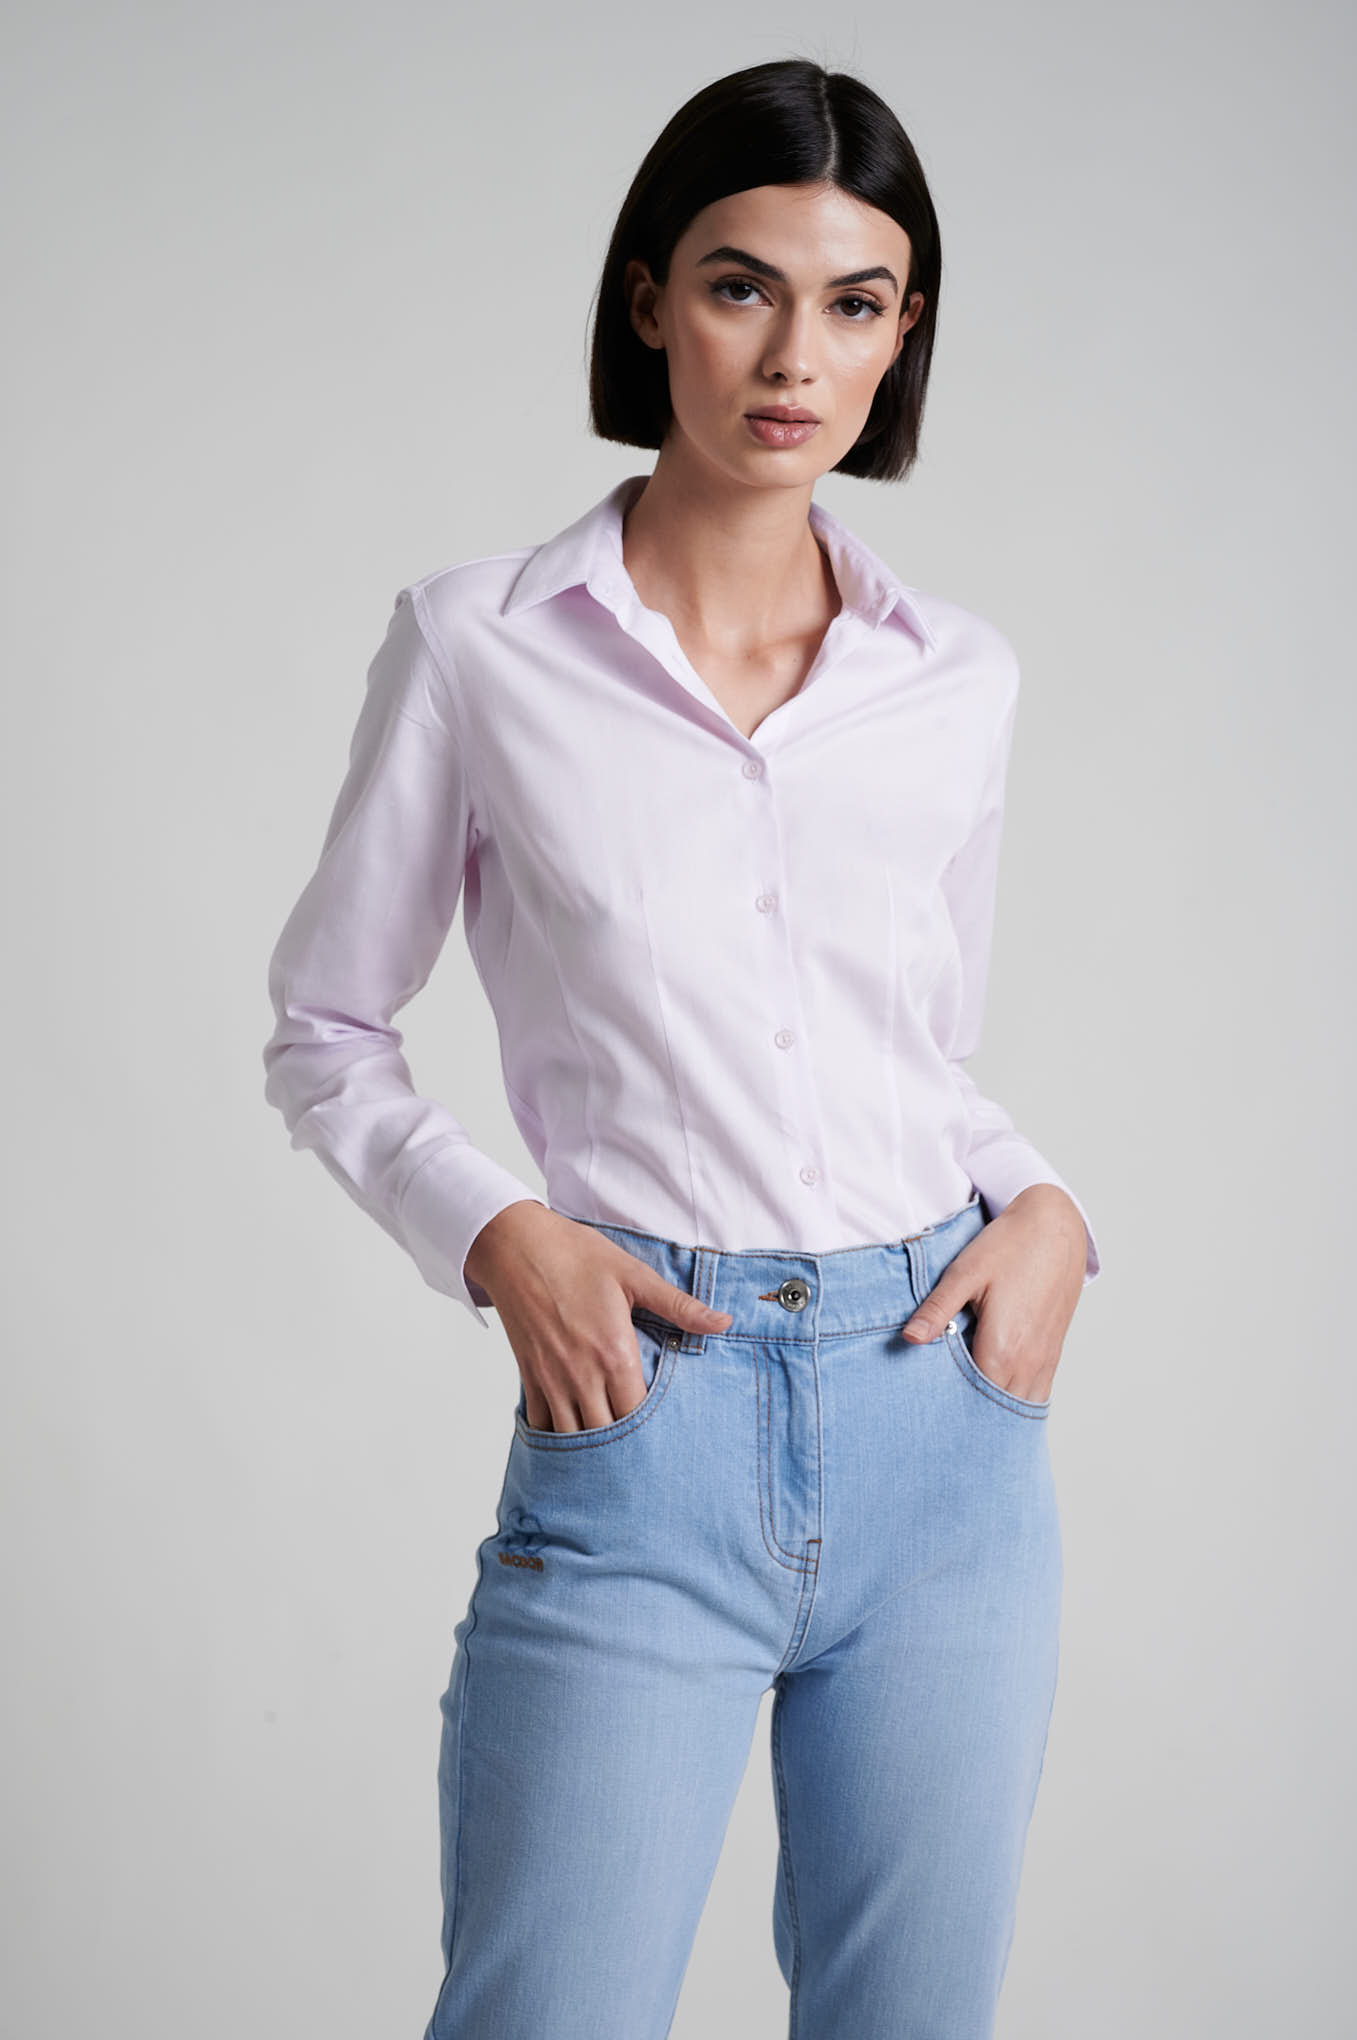 Shirt Pink Formal Woman